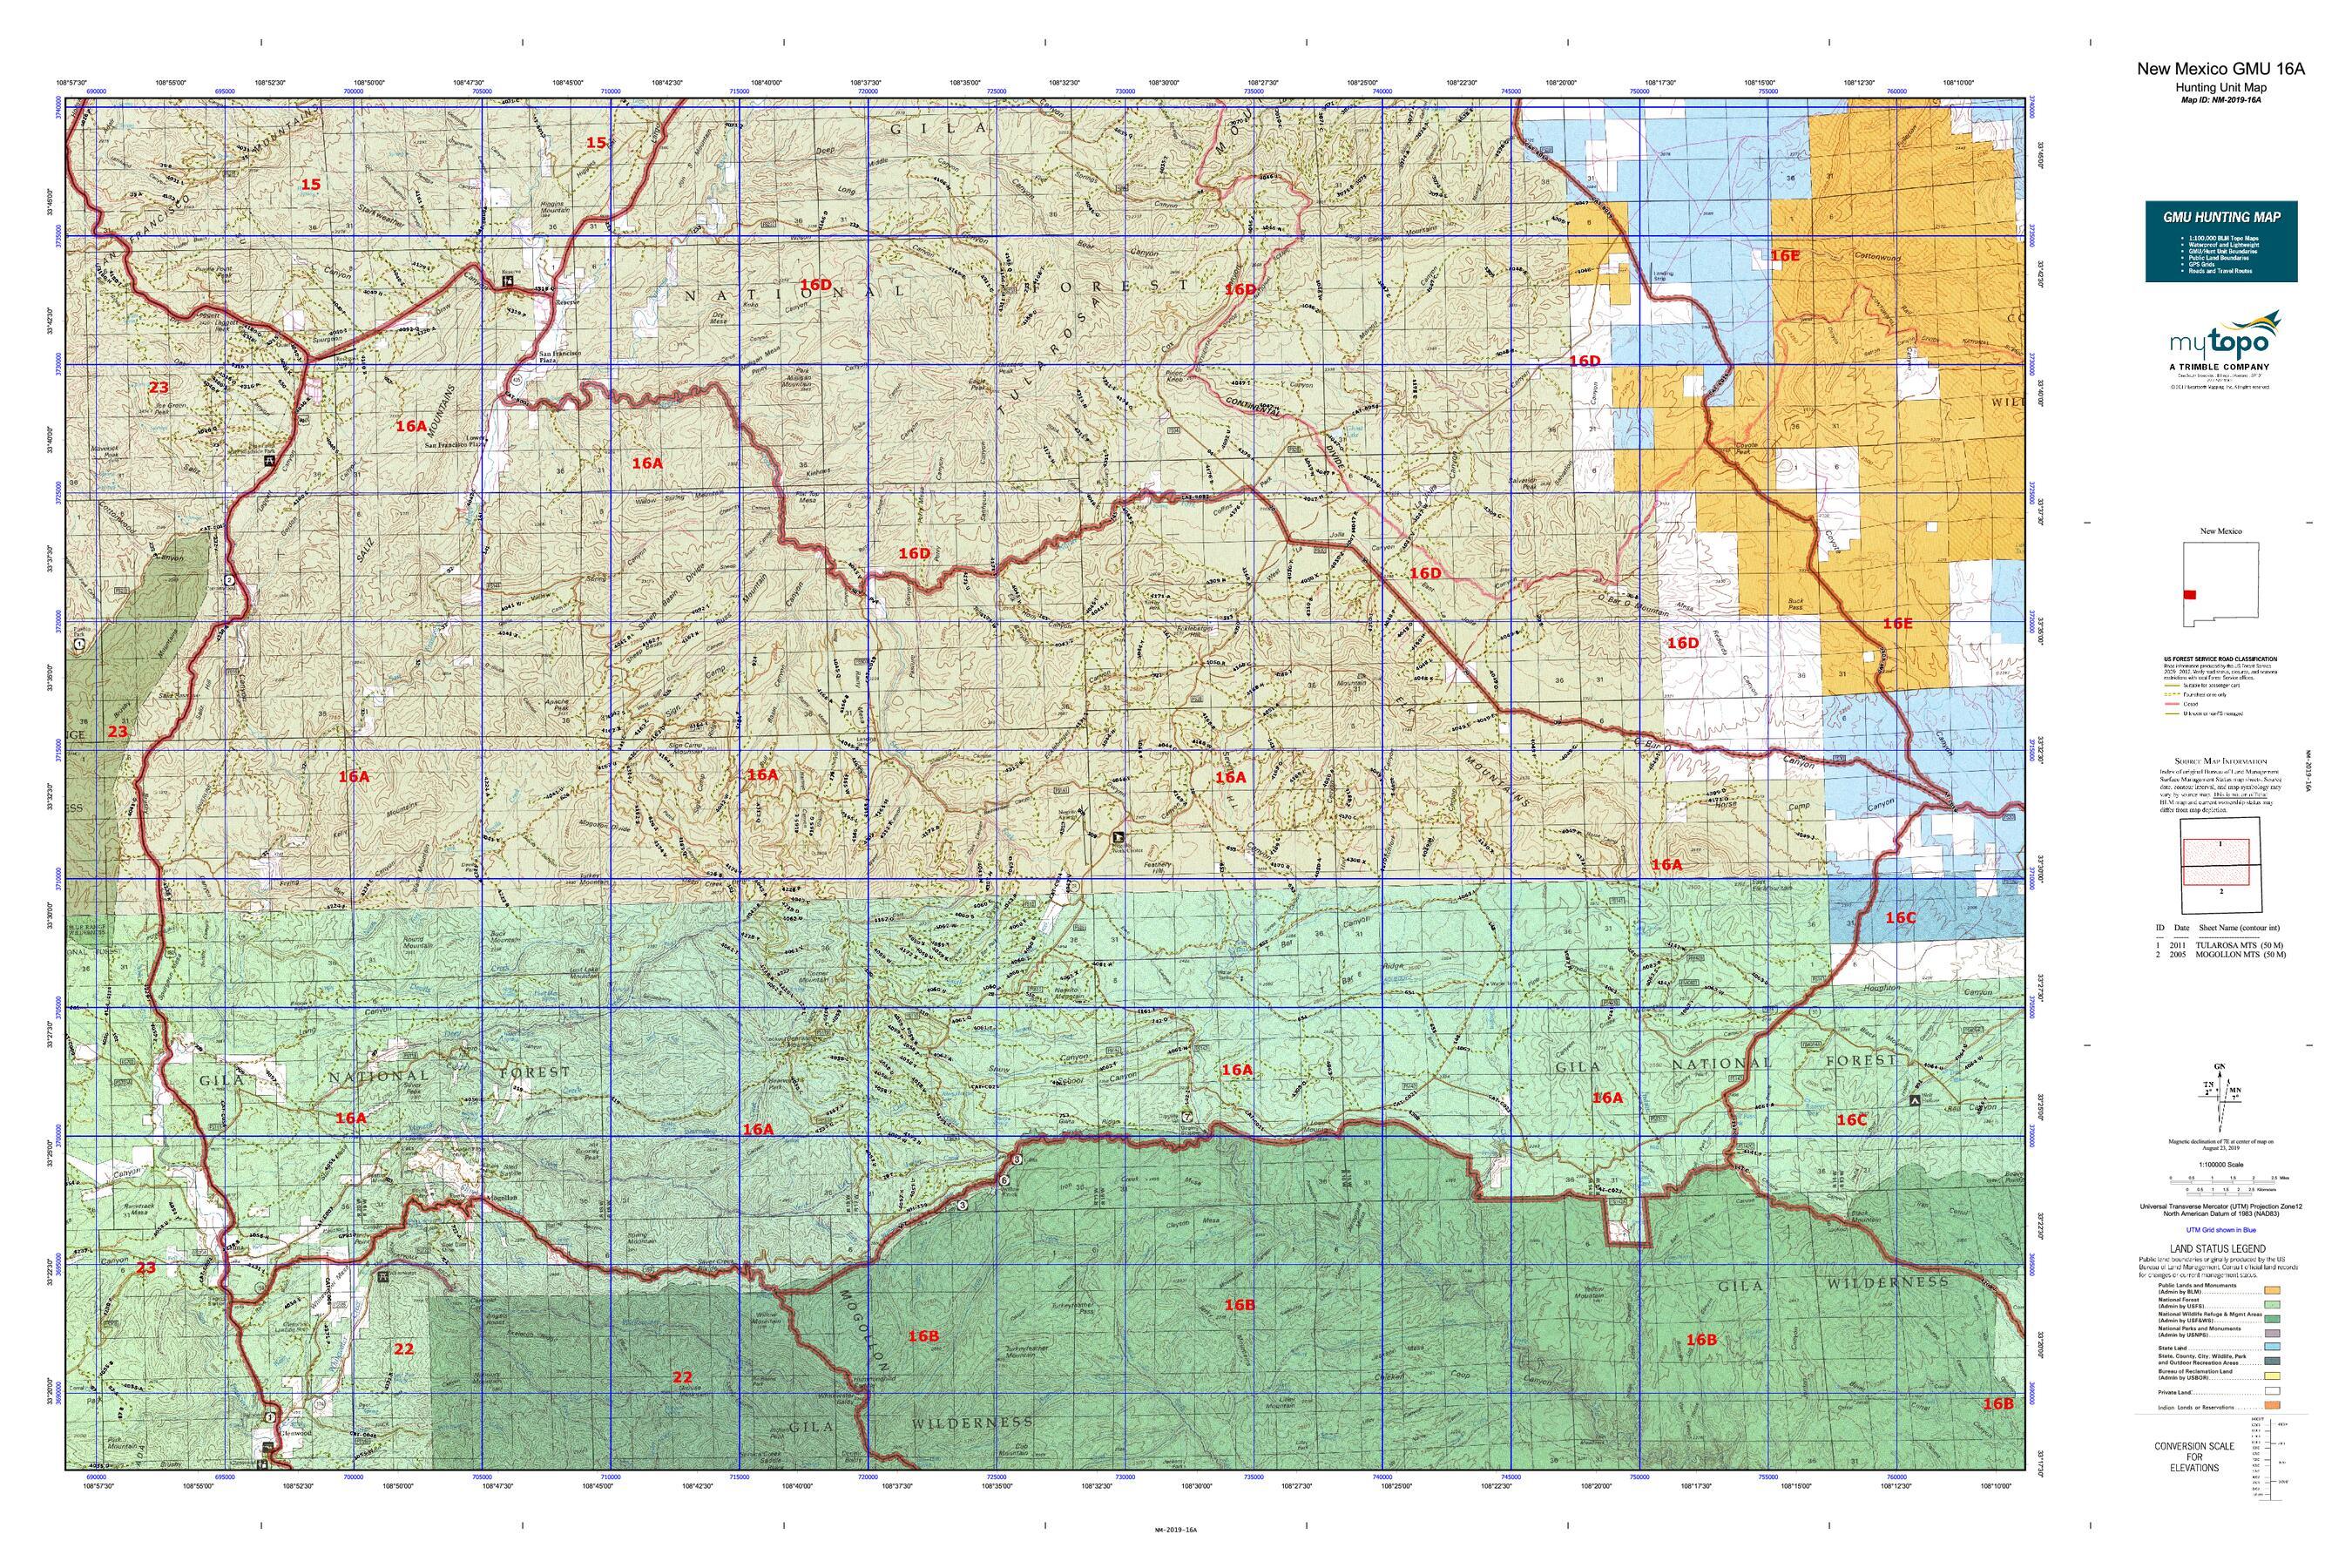 New Mexico GMU 16A Map | MyTopo on hawaii map, oklahoma map, iowa map, illinois map, indiana map, texas map, north dakota map, four corners map, usa map, maine map, new jersey map, california map, united states map, louisiana map, santa fe map, nevada map, southwestern us map, southern us map, ohio map, arkansas map, minnesota map, montana map, colorado map, north carolina map, missouri map, nm map, maryland map, wisconsin map, michigan map, western us map, mississippi map, arizona map, florida map, utah map,